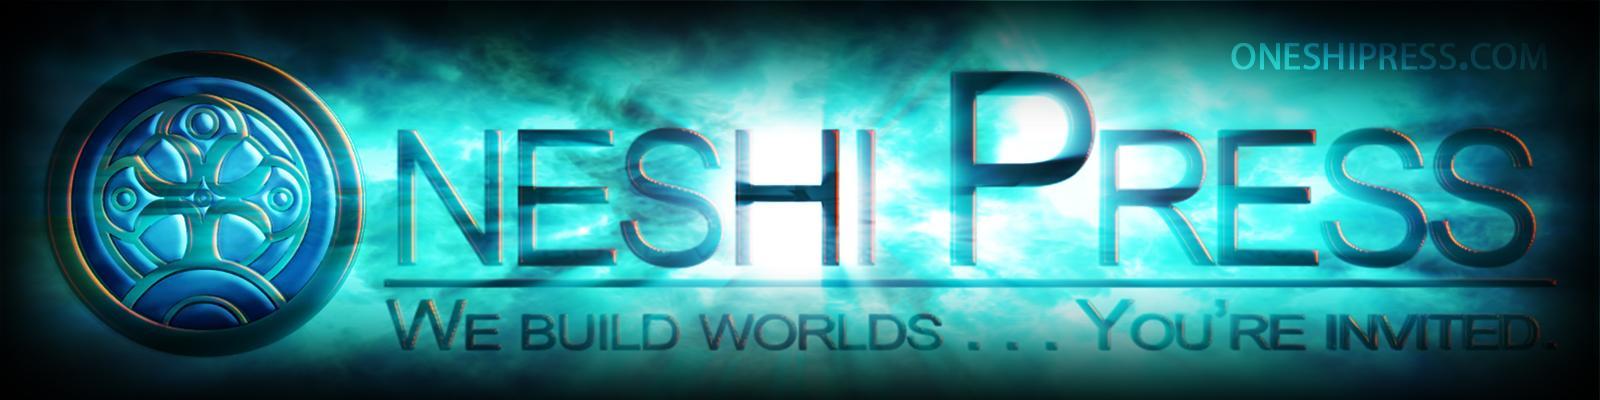 Oneshi Press - Cosmic Banner